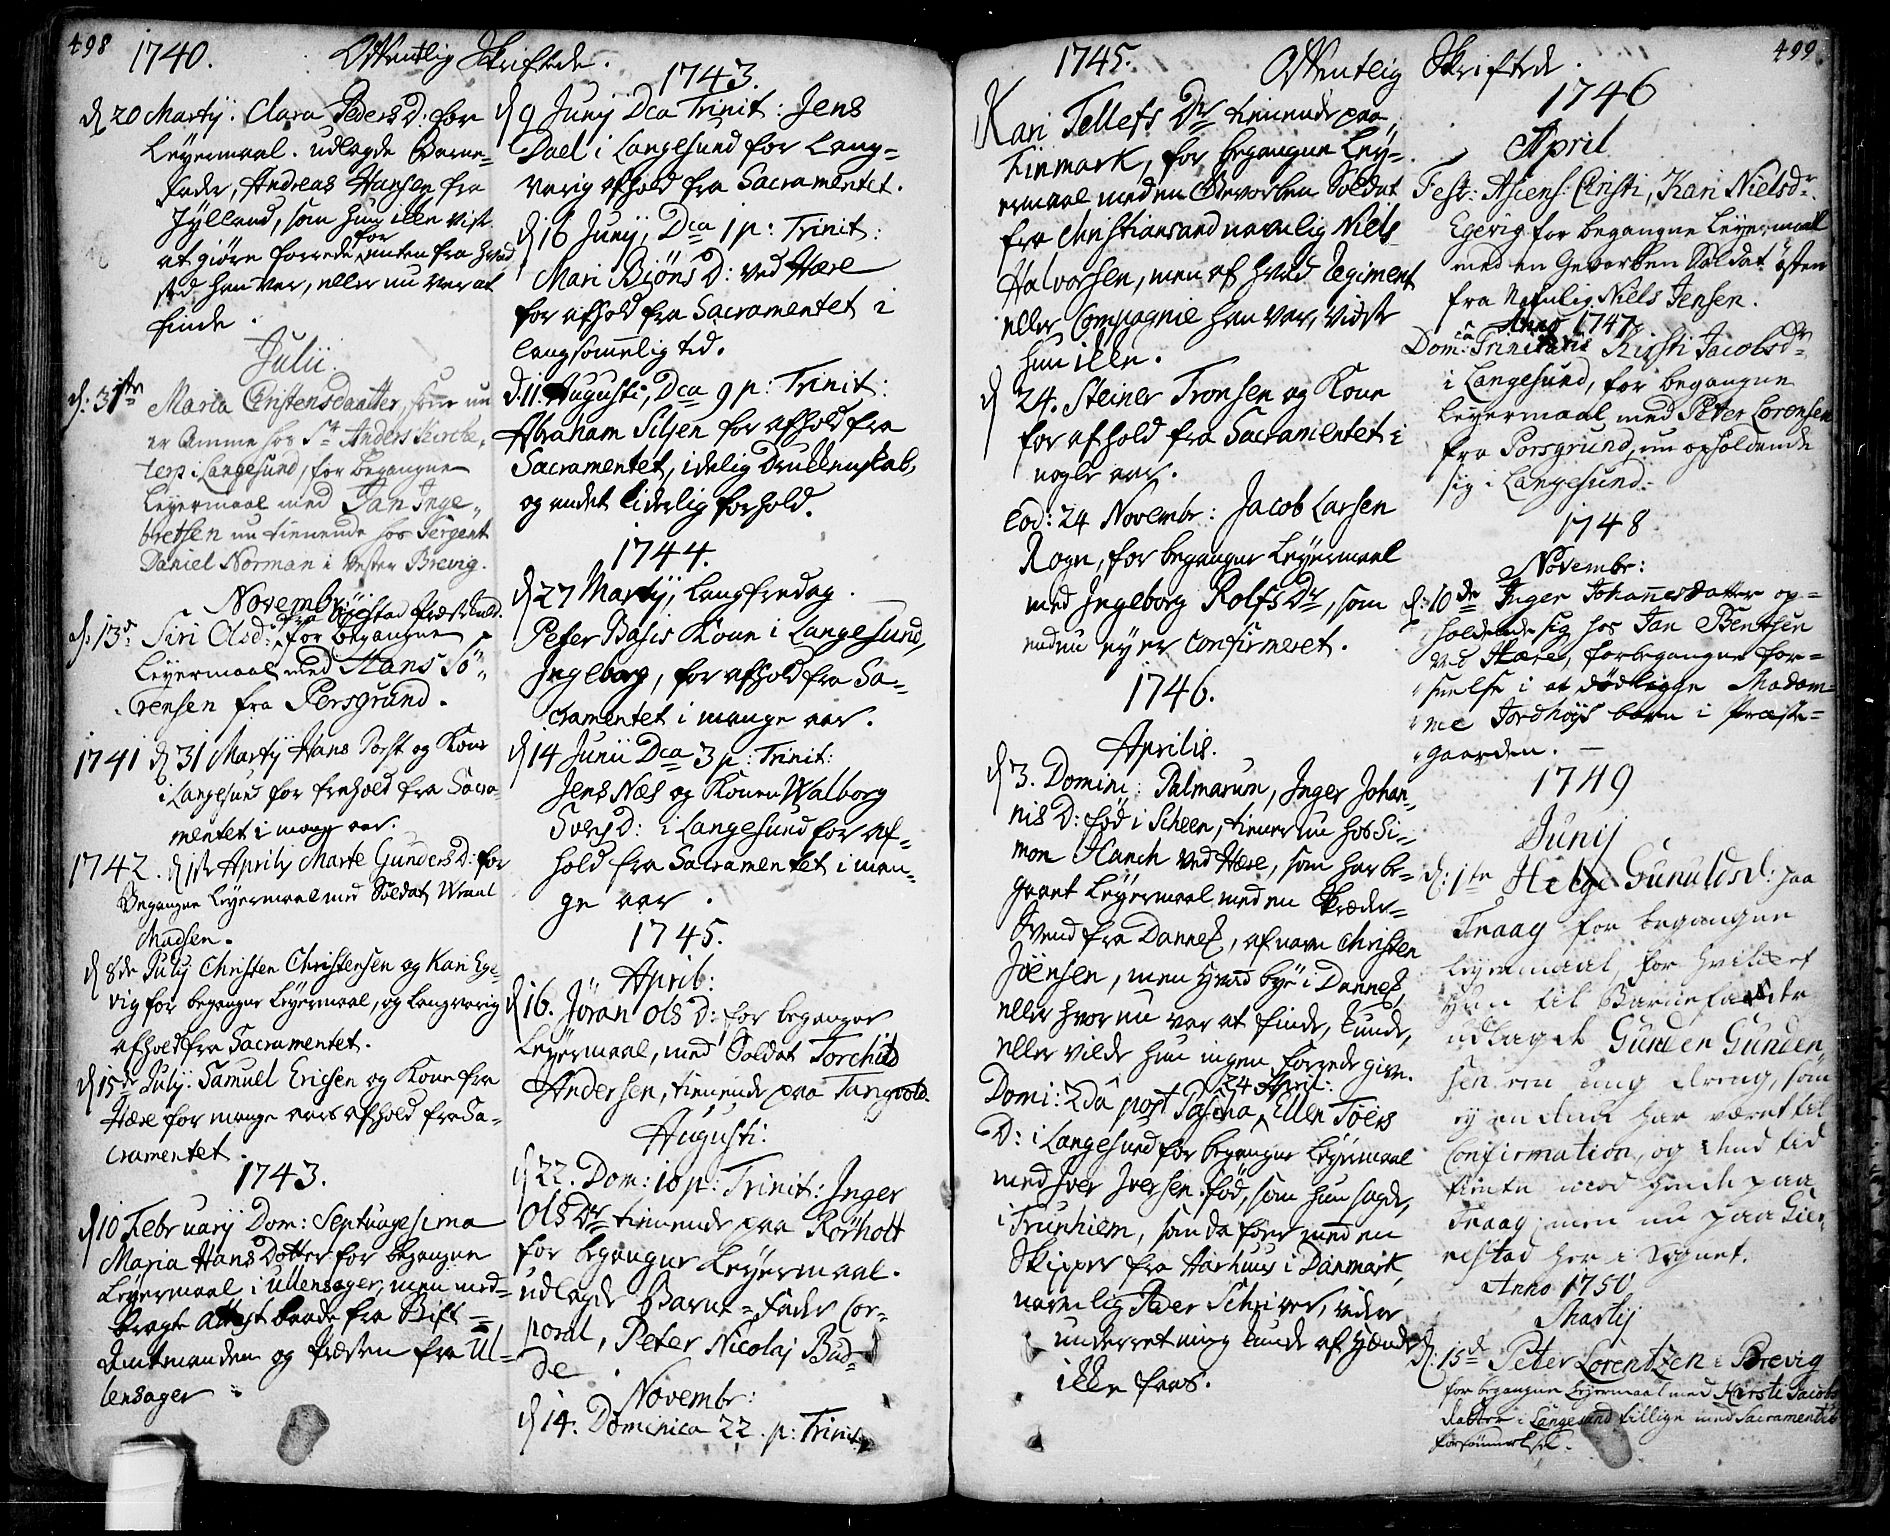 SAKO, Bamble kirkebøker, F/Fa/L0001: Ministerialbok nr. I 1, 1702-1774, s. 498-499